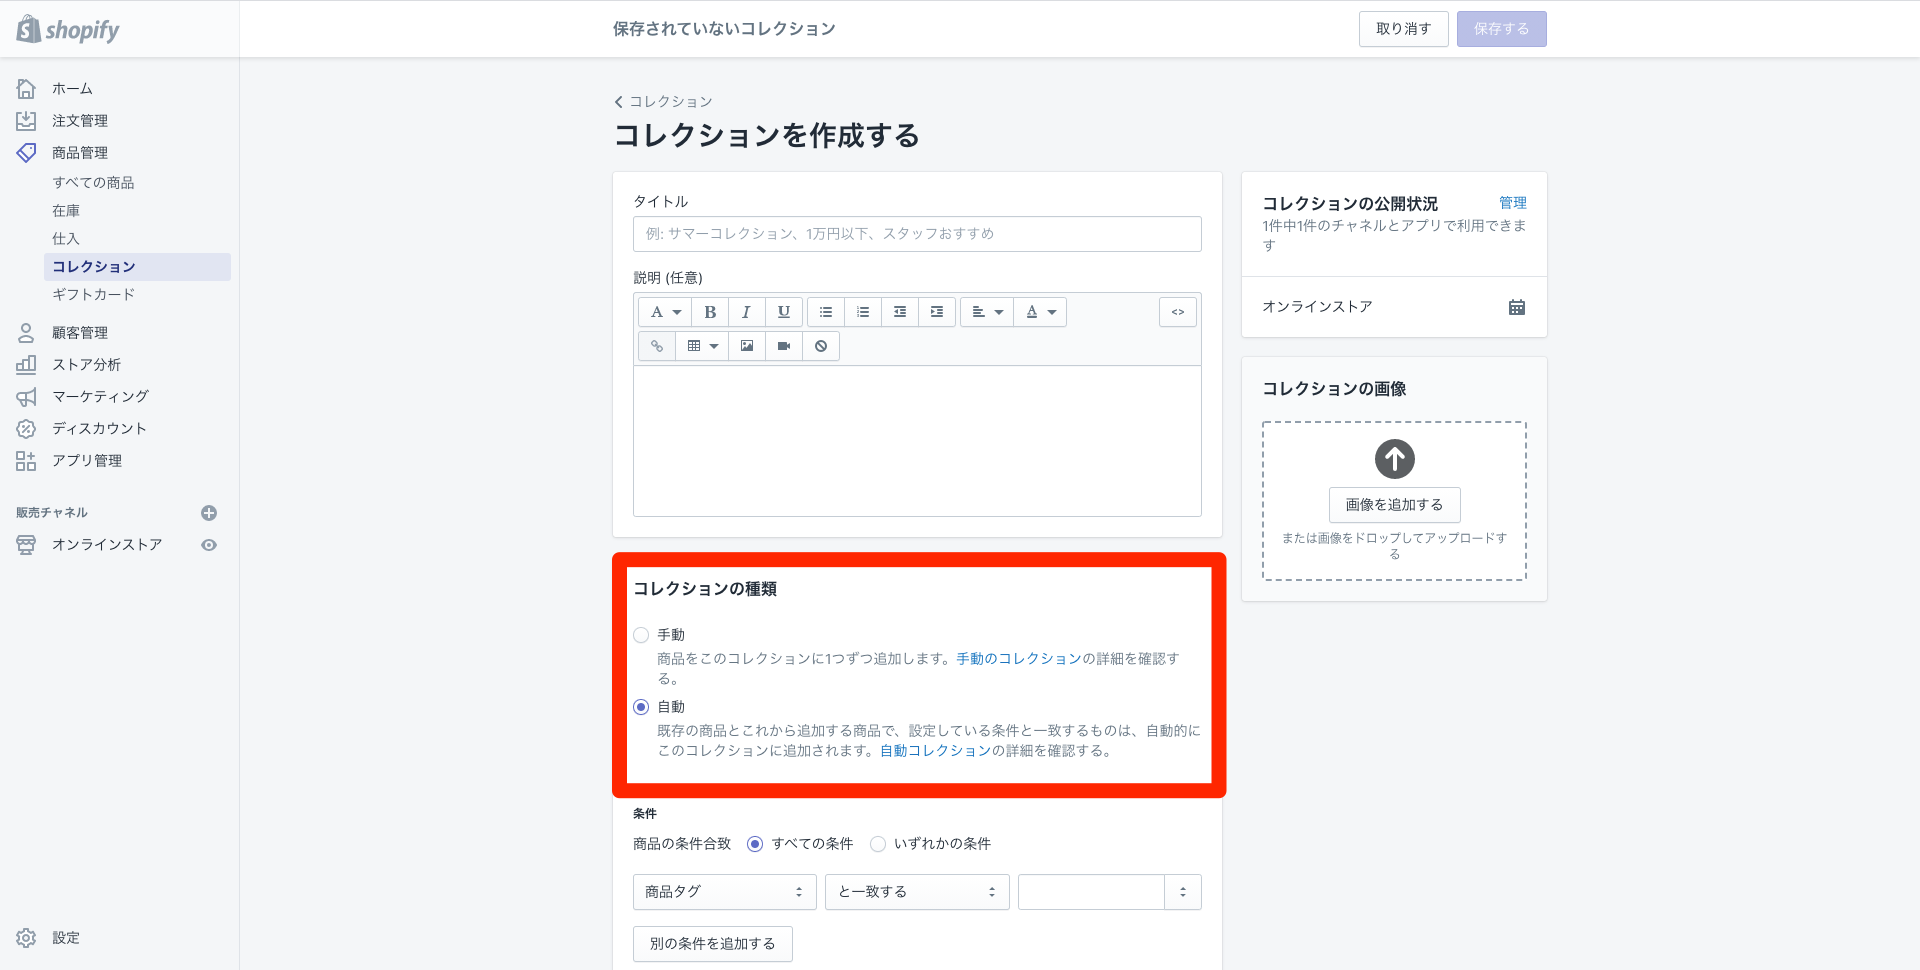 shopify-create-3